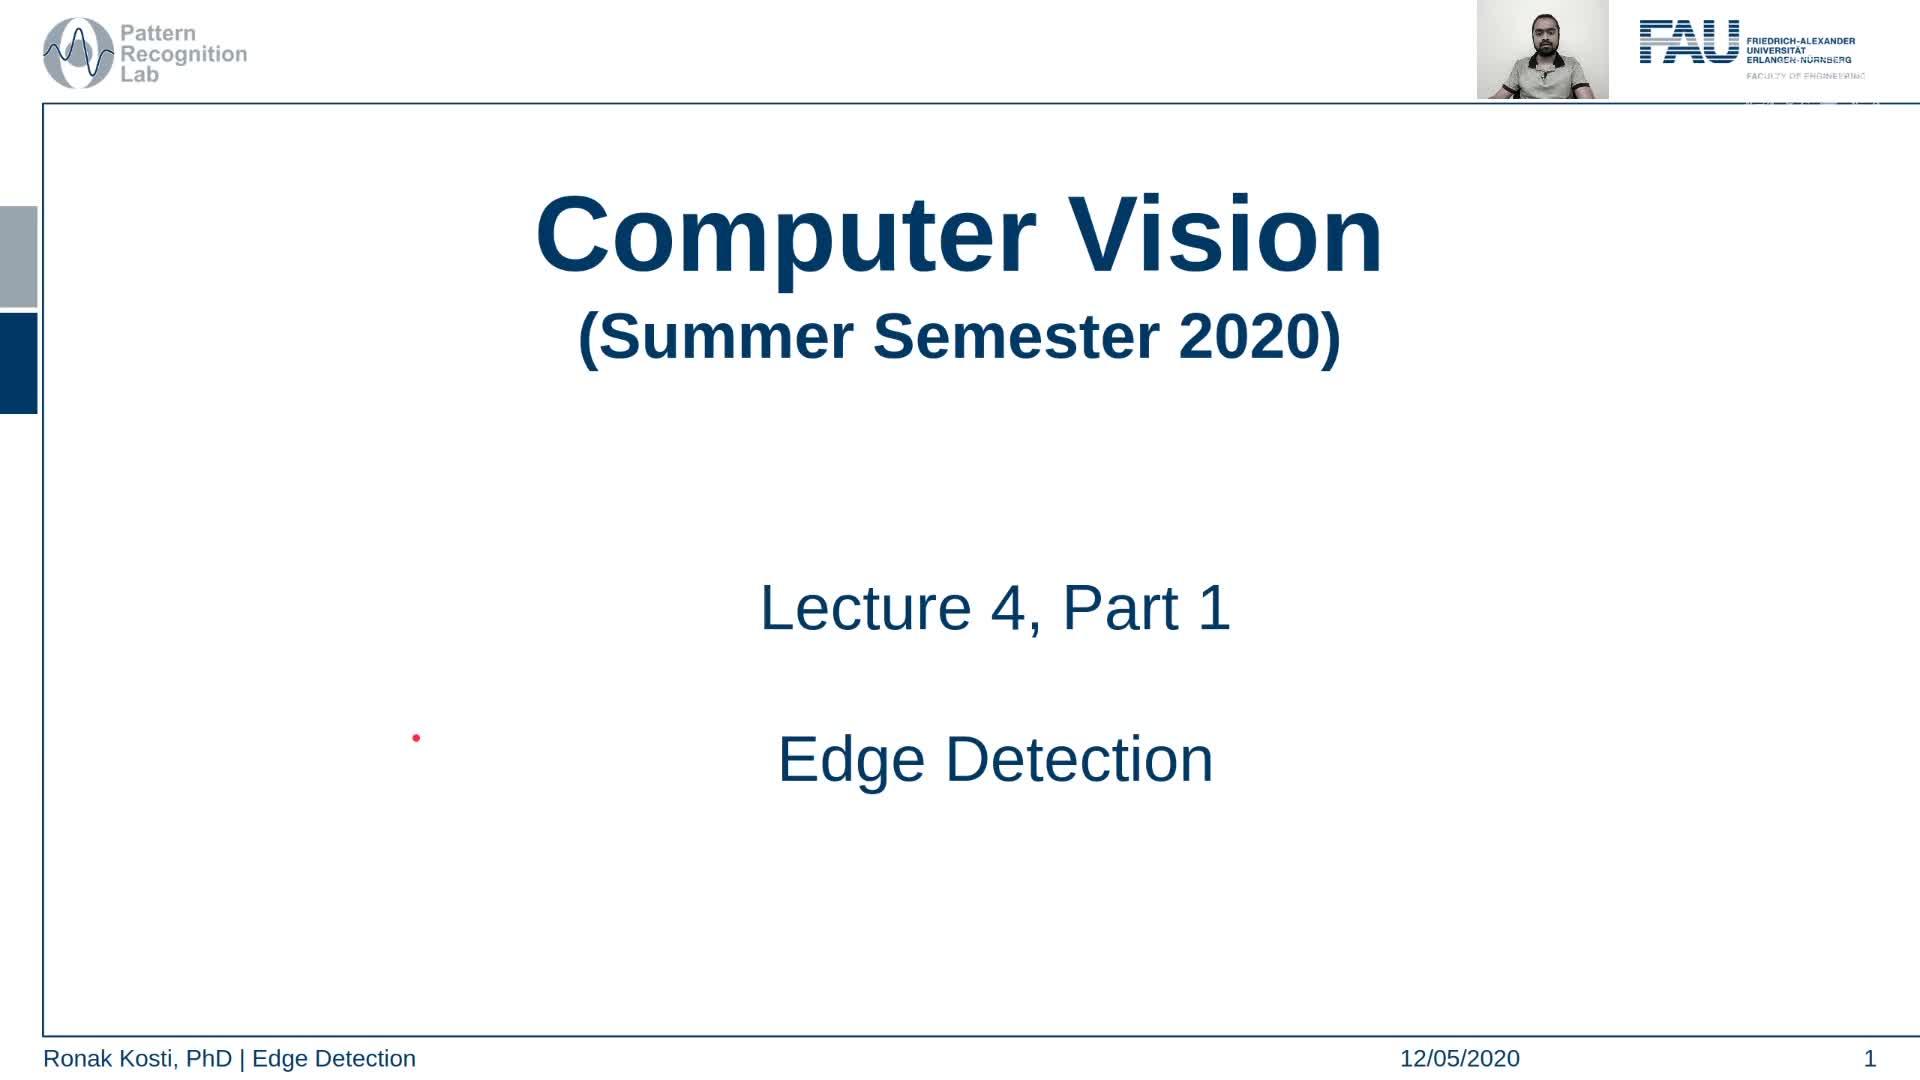 Edge Detection (Lecture 4, Part 1) preview image